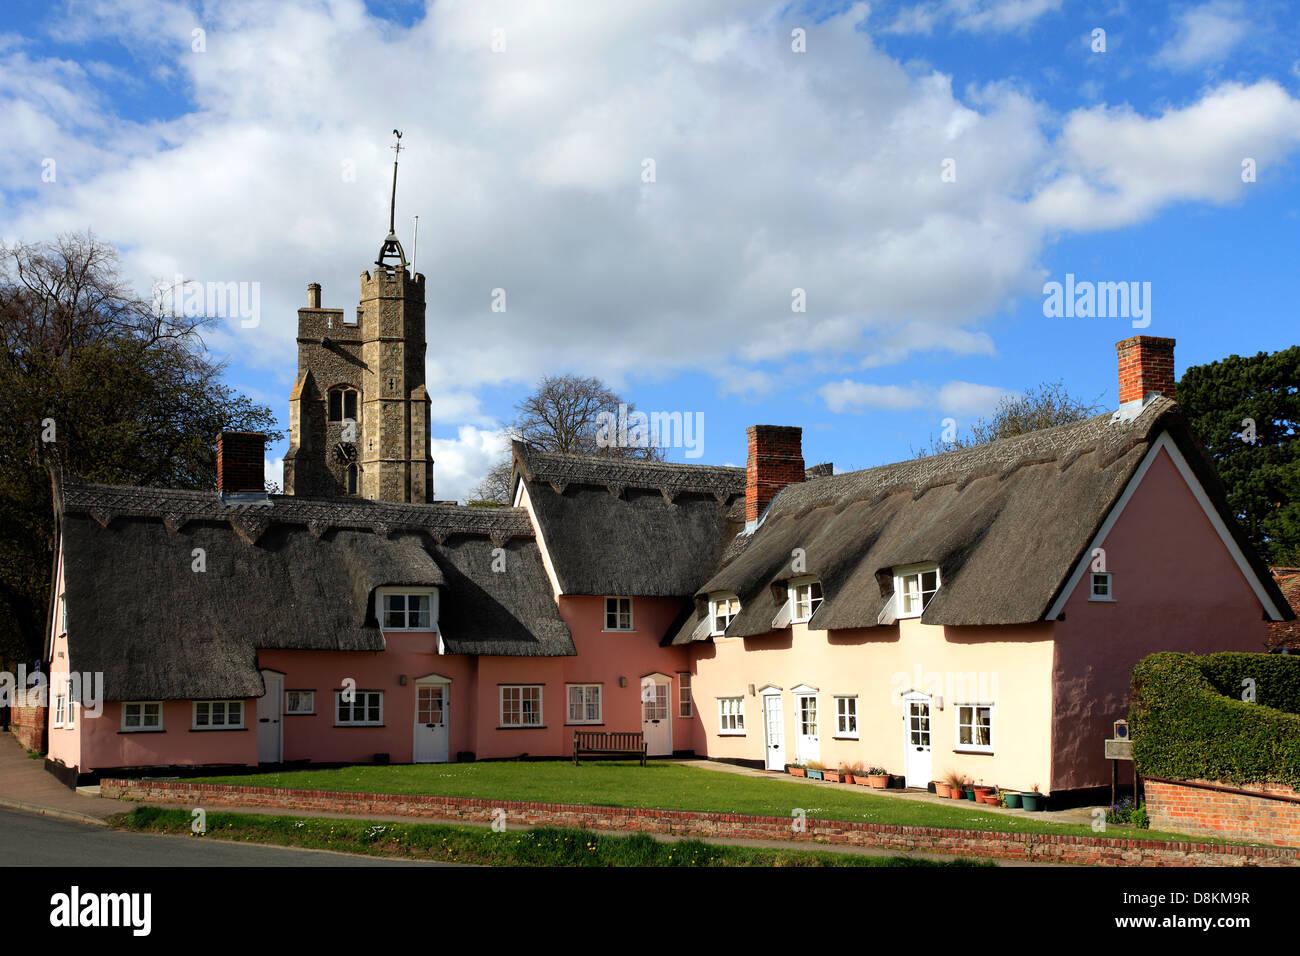 Parish church of St Marys, Cavendish village, Suffolk County, England, Britain. - Stock Image